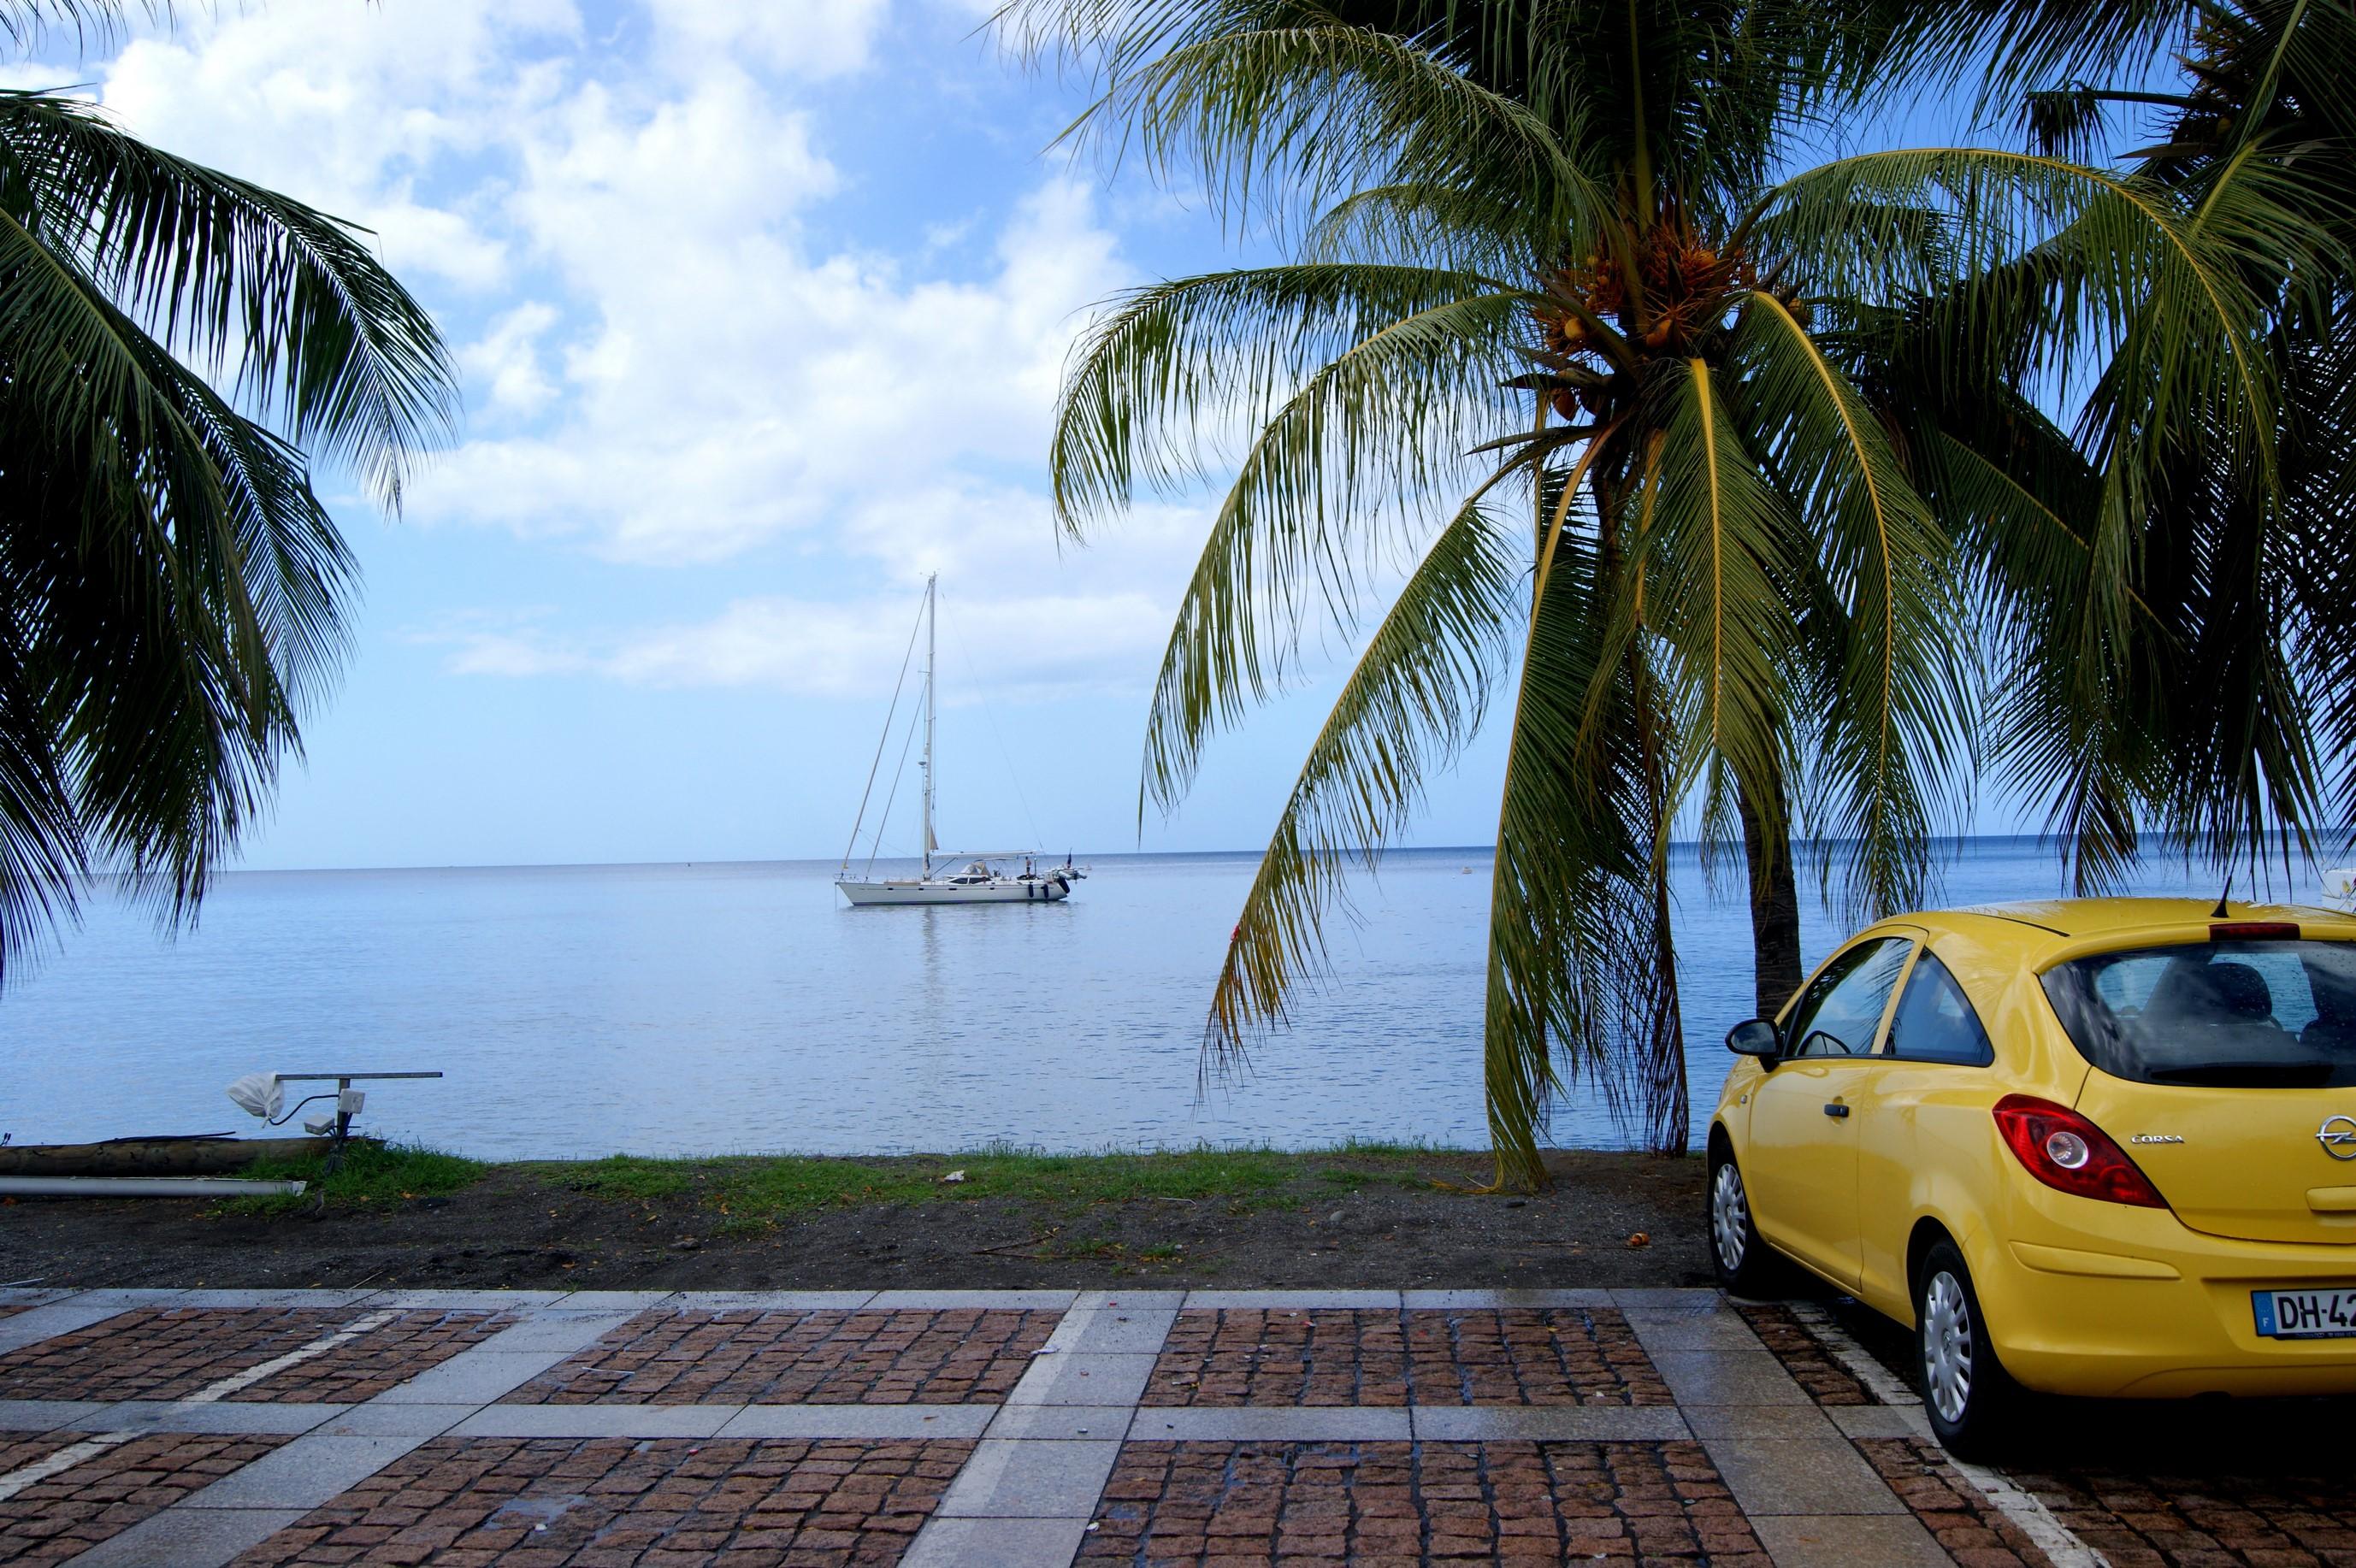 Ot taki zwykły parking i nasza bananowa Corsa ;)